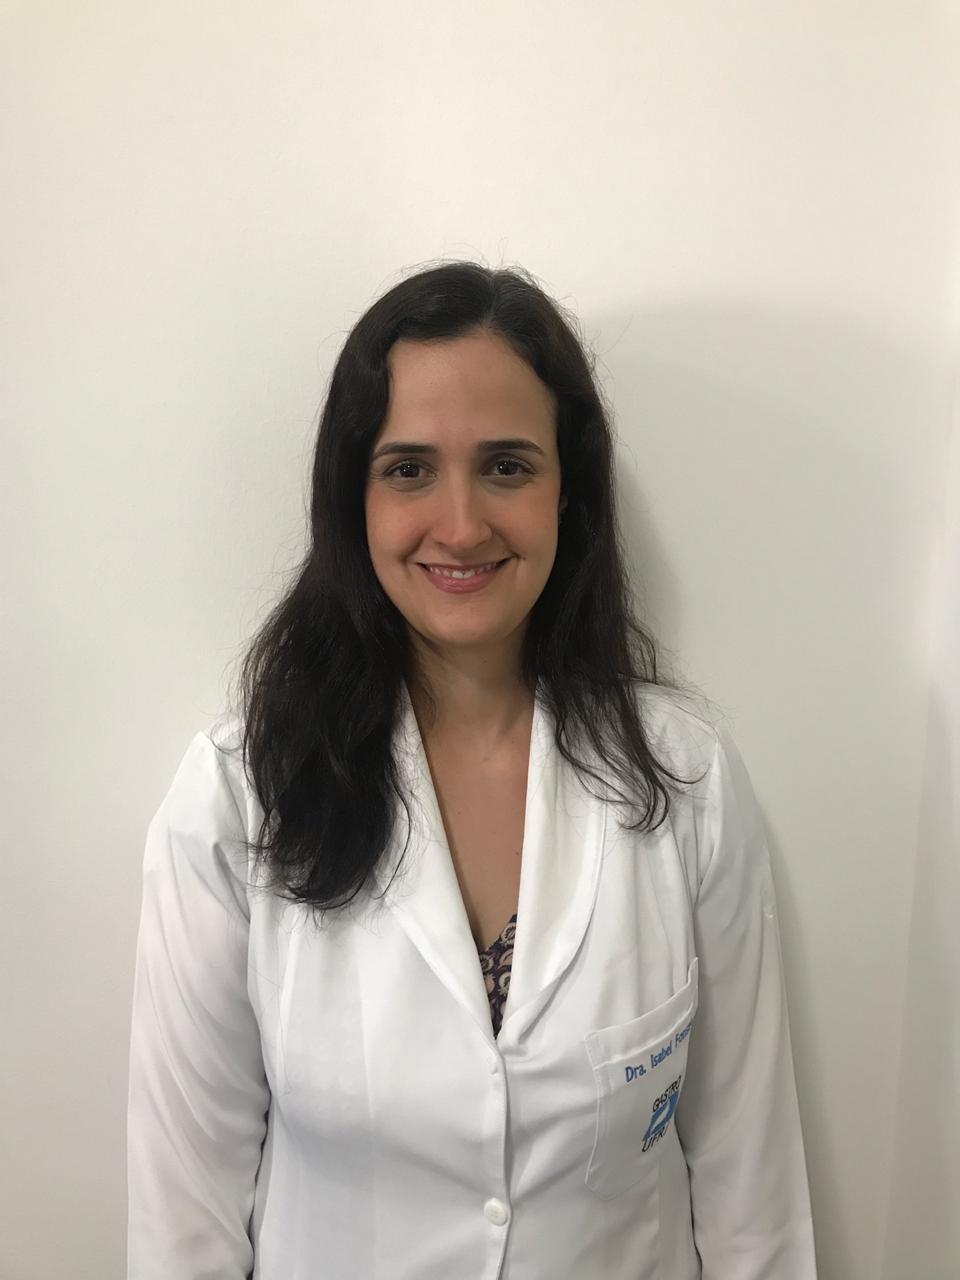 Dra. Isabel Fonseca Santos